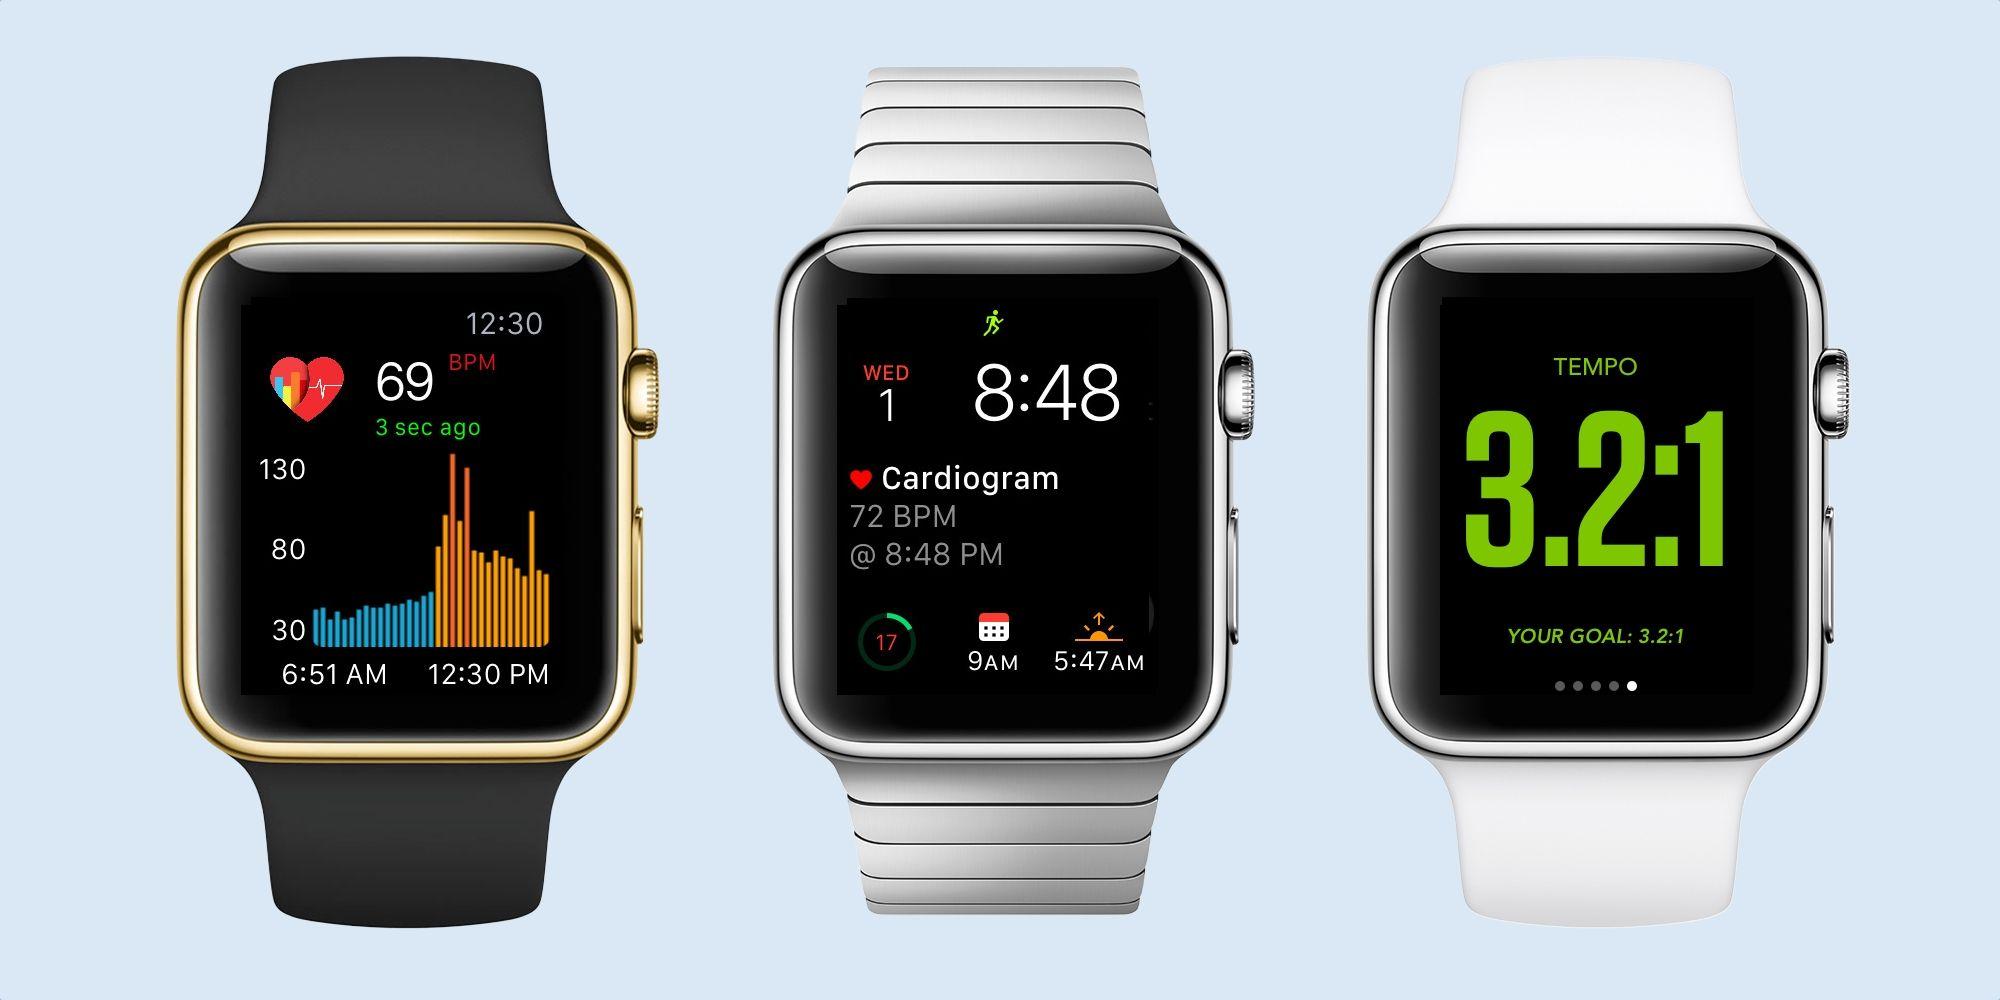 Cardiogram brings heart rate graph to watchos as zepp golf